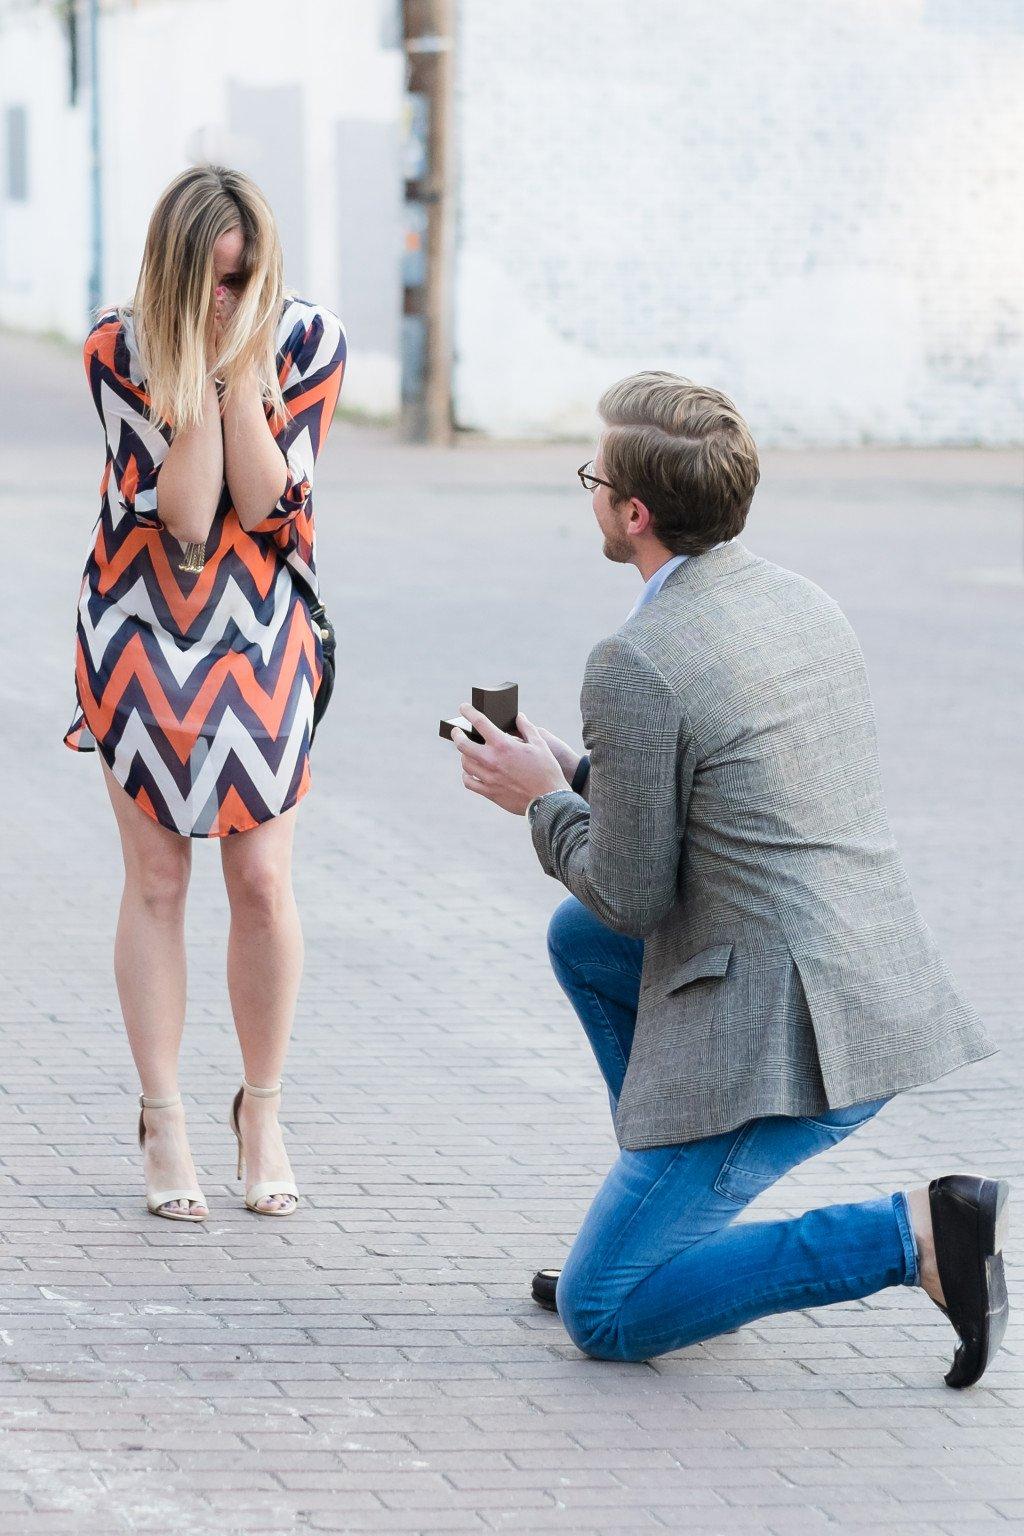 Proposal Photography: The Six Must-Have Photos | Washingtonian (DC)